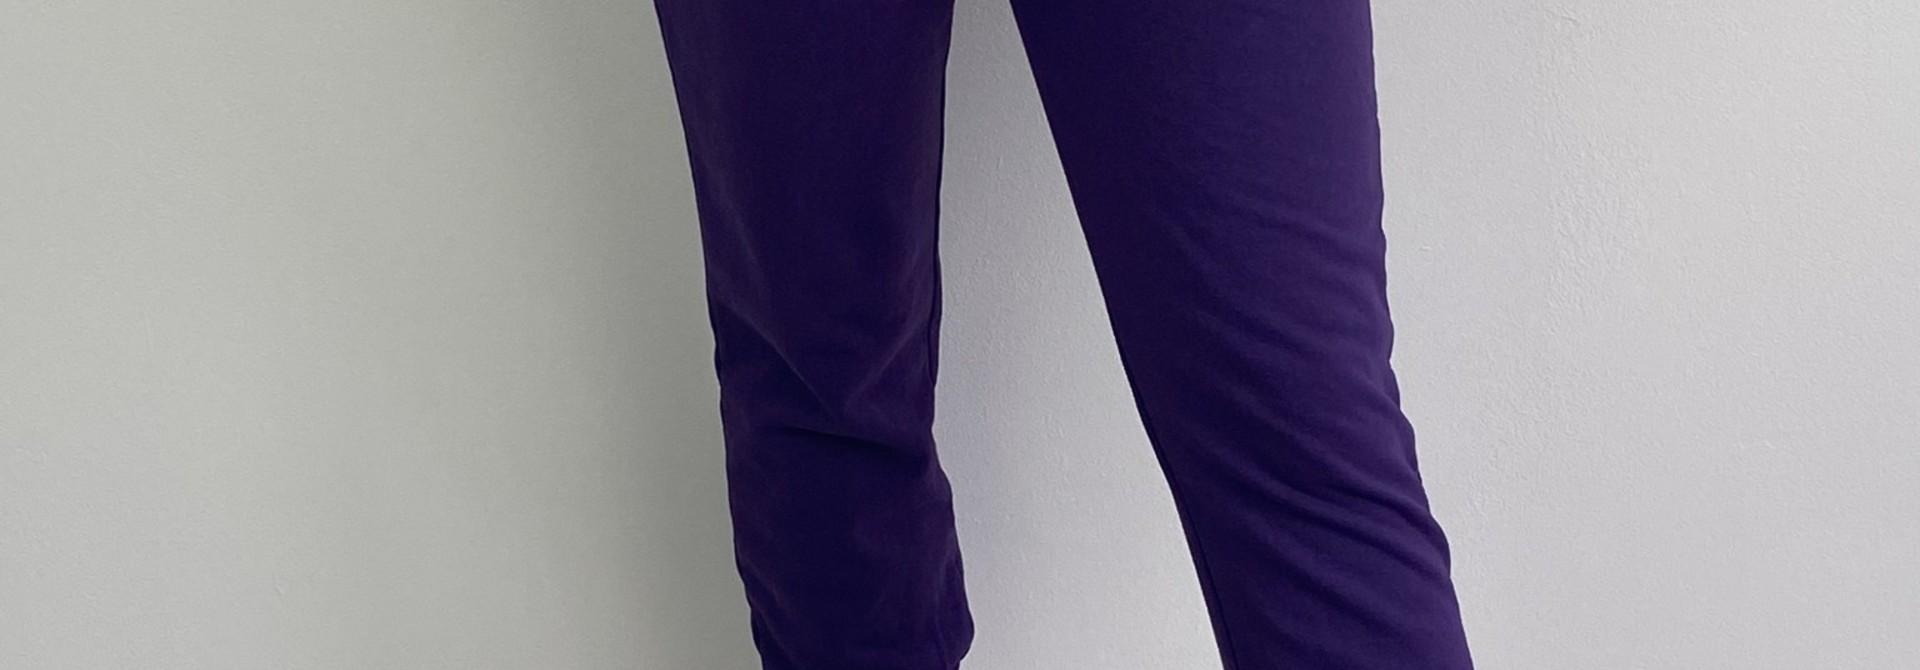 Sunki sweatpant Purple